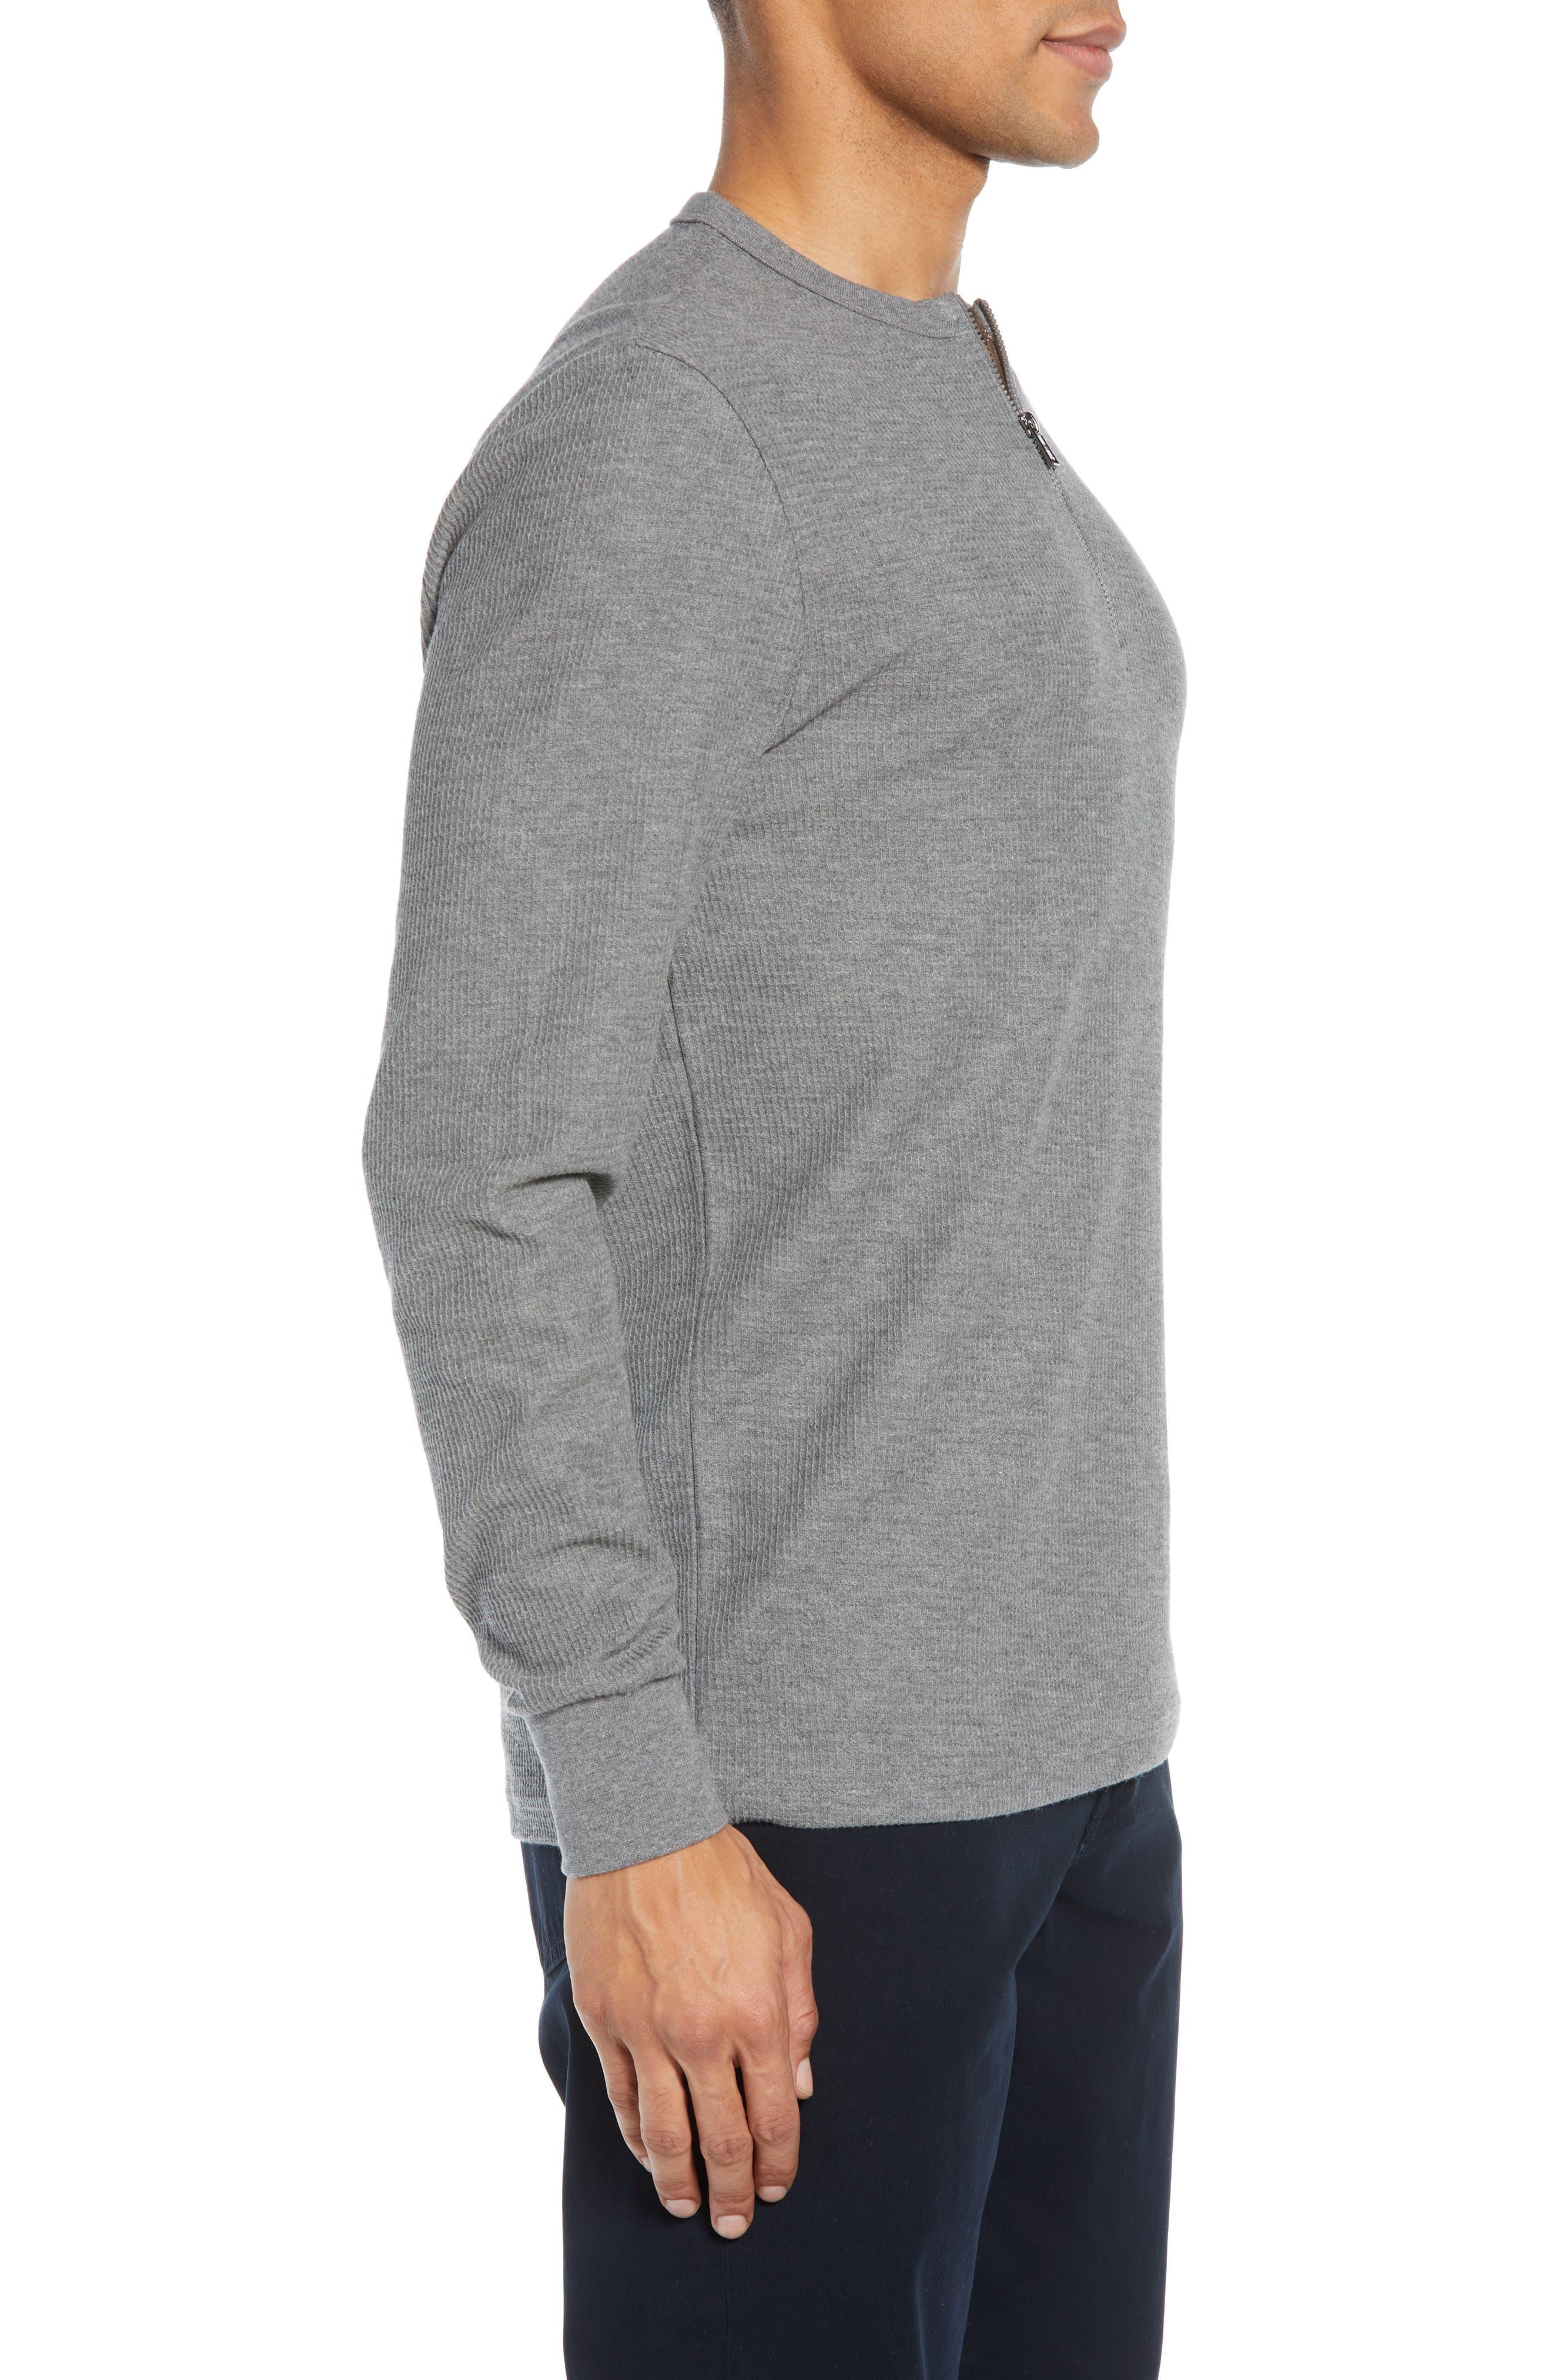 Textor Quarter Zip Thermal T-Shirt,                             Alternate thumbnail 3, color,                             GREY